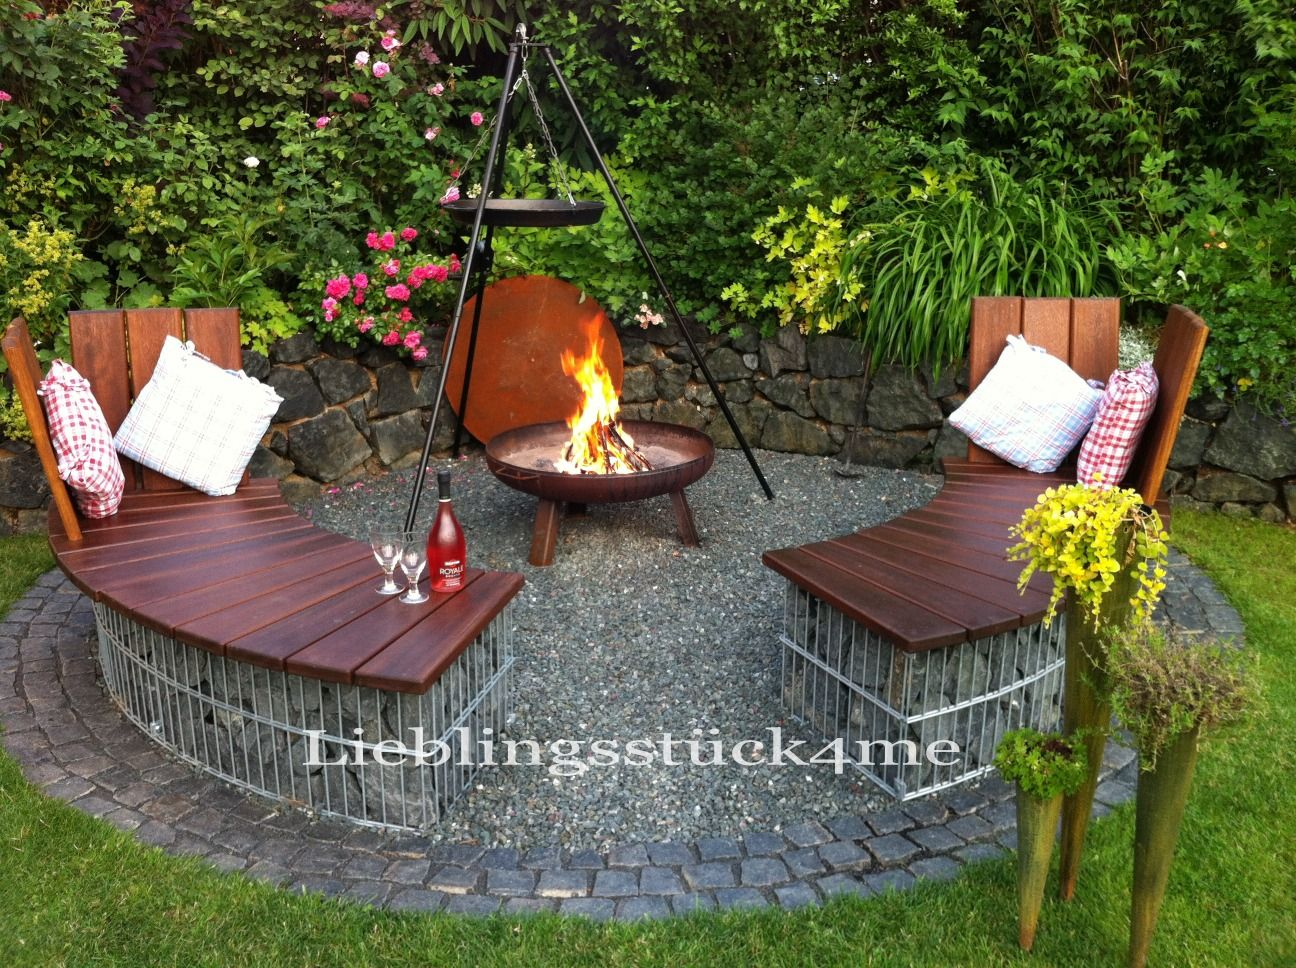 garten anlegen grillplatz grillplatz ideen sch n. Black Bedroom Furniture Sets. Home Design Ideas